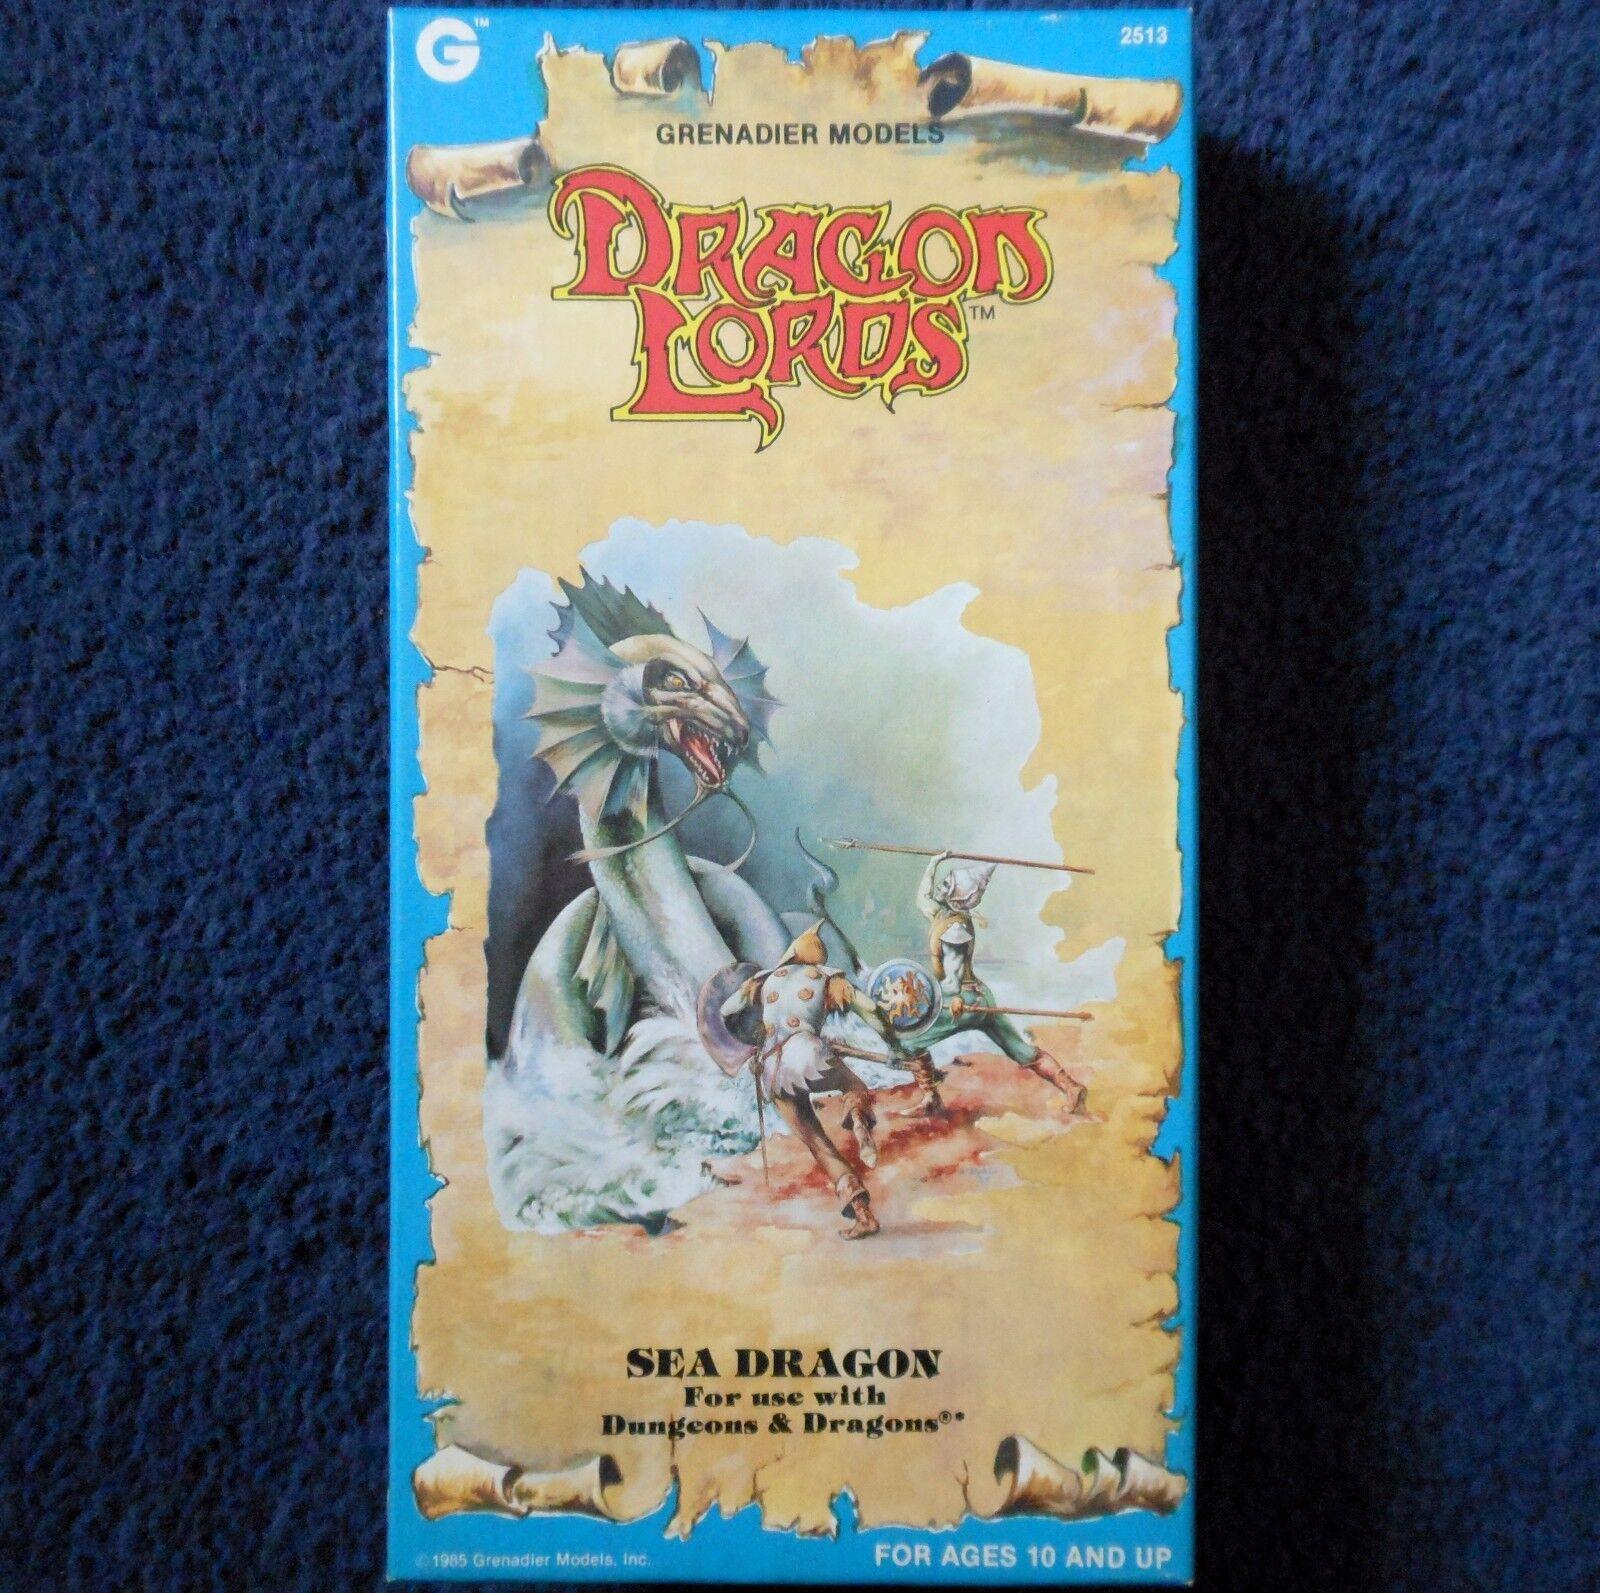 1985 Sea Dragon Lords Grenadier Models 2513 Dungeons & Dragons AD&D Wyrm Fantasy